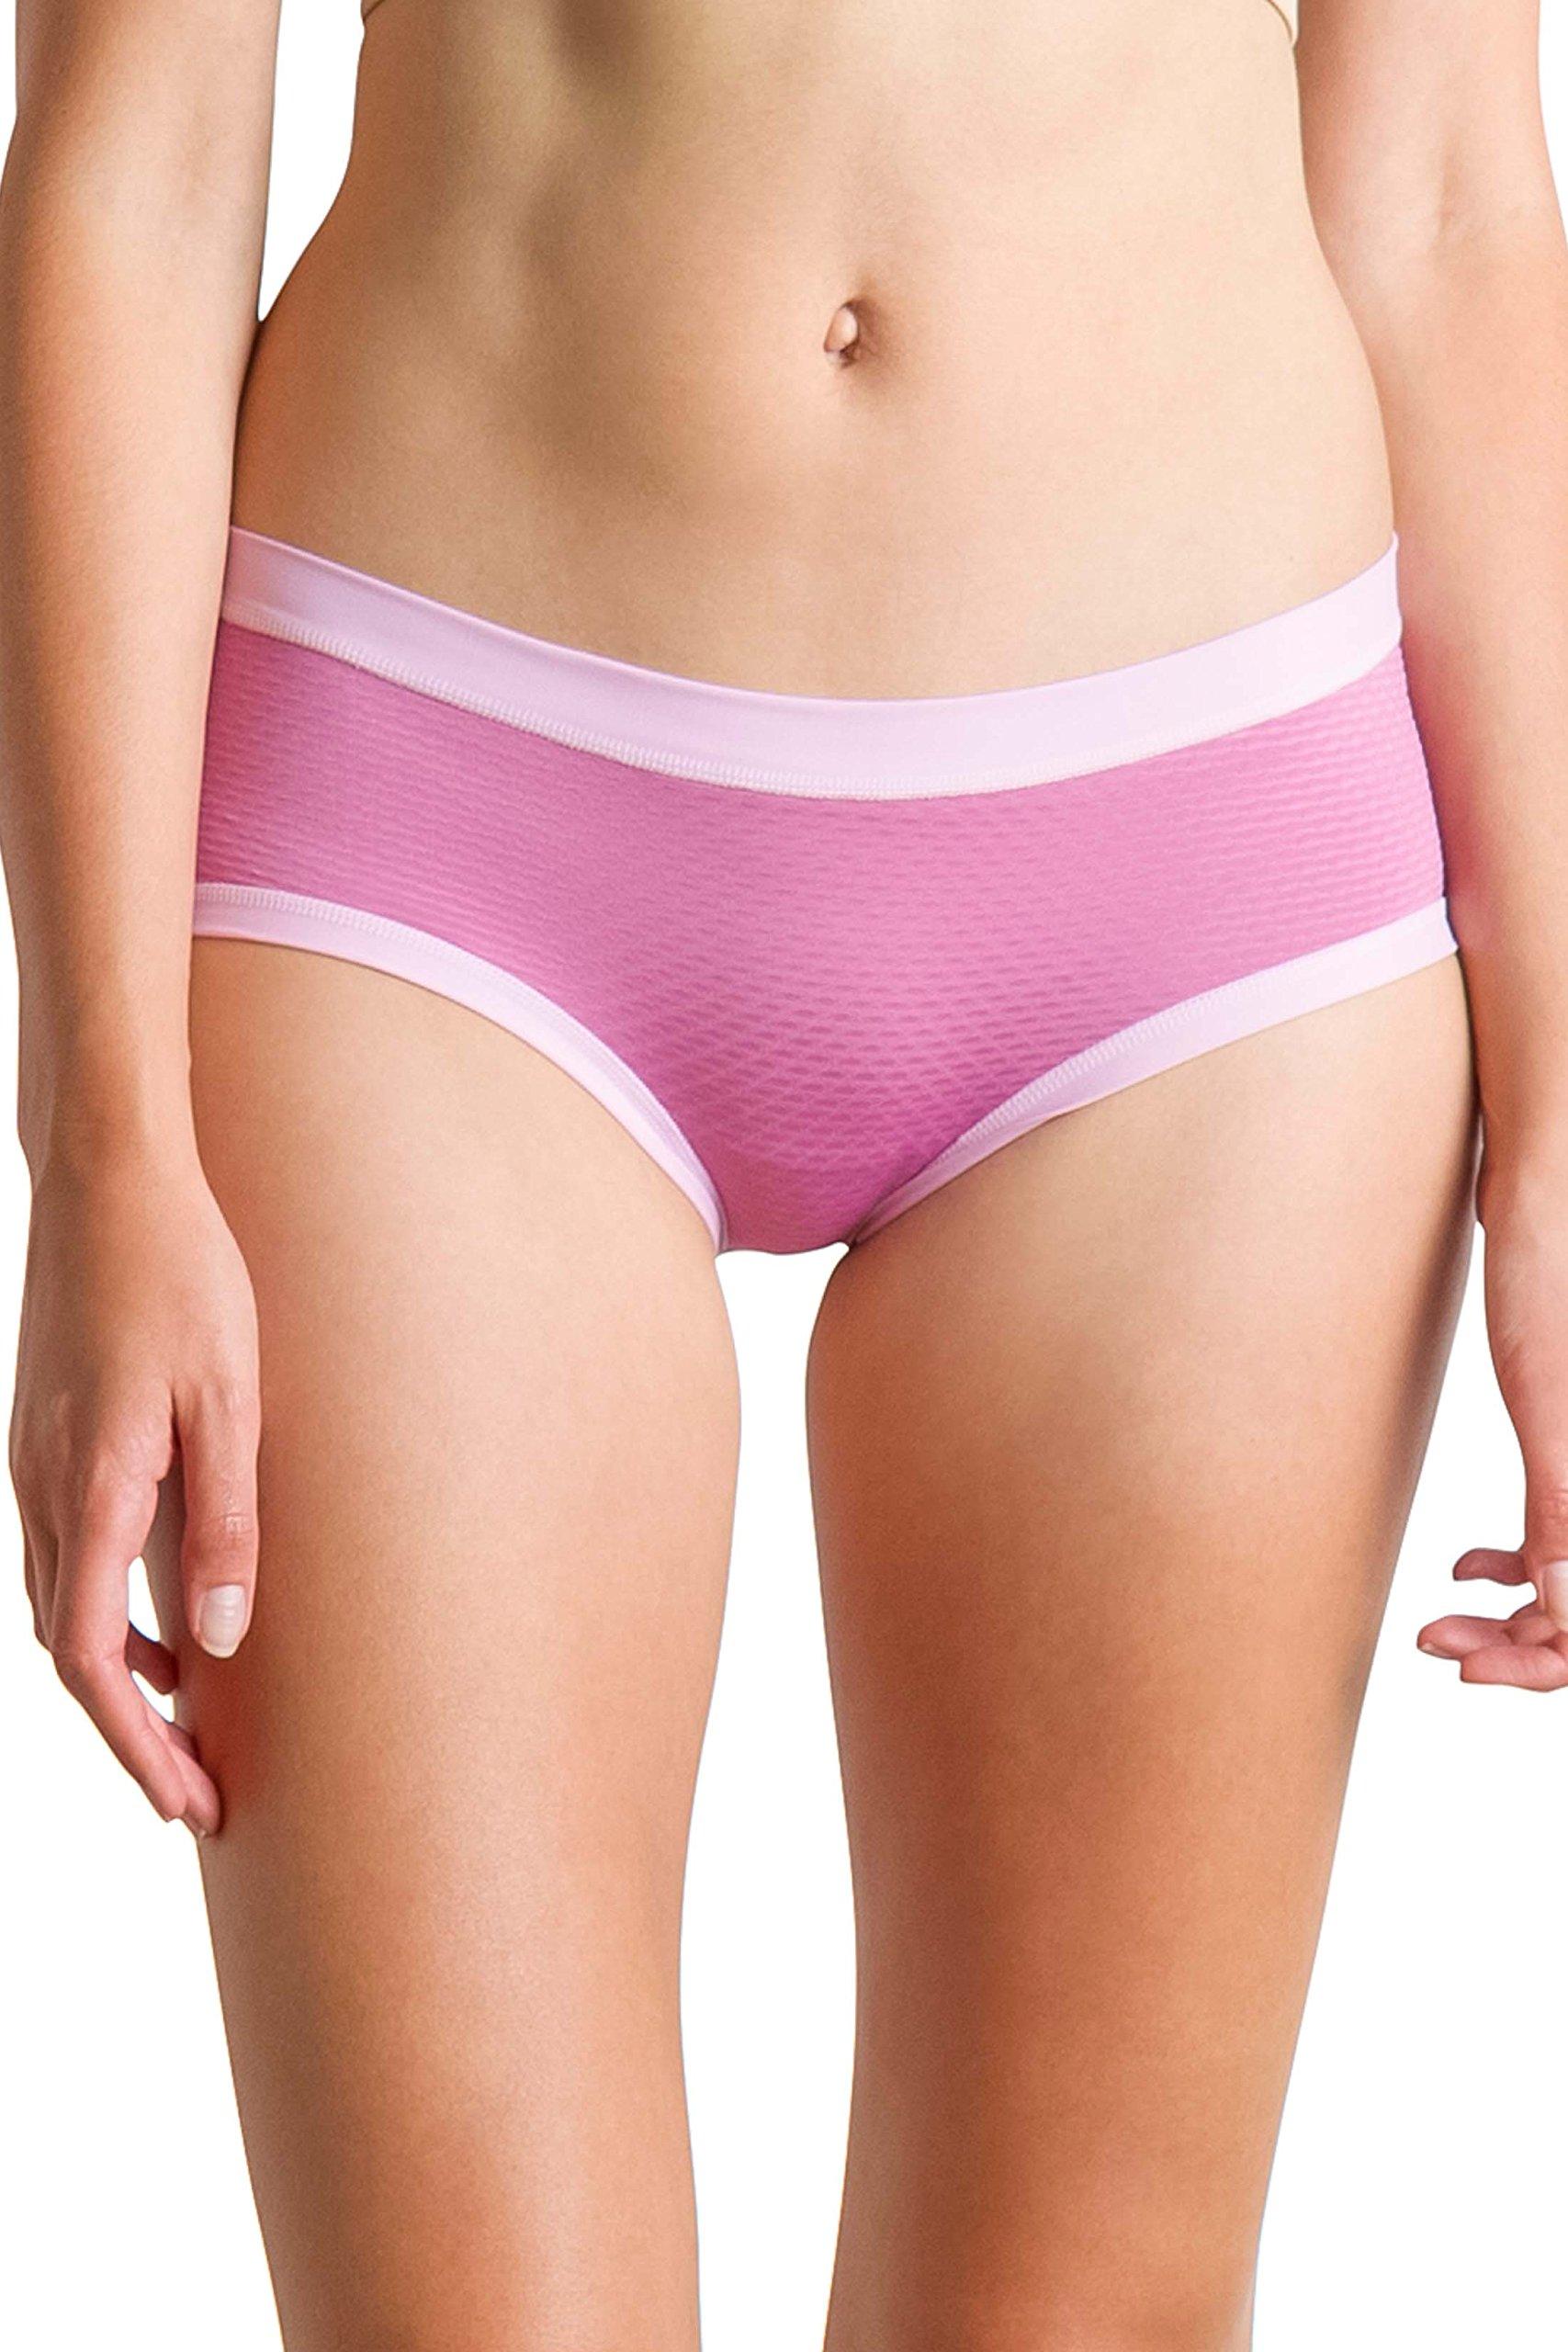 ExOfficio Women's Give-N-Go Sport Mesh Hipkini Underwear, Sweetheart, Medium